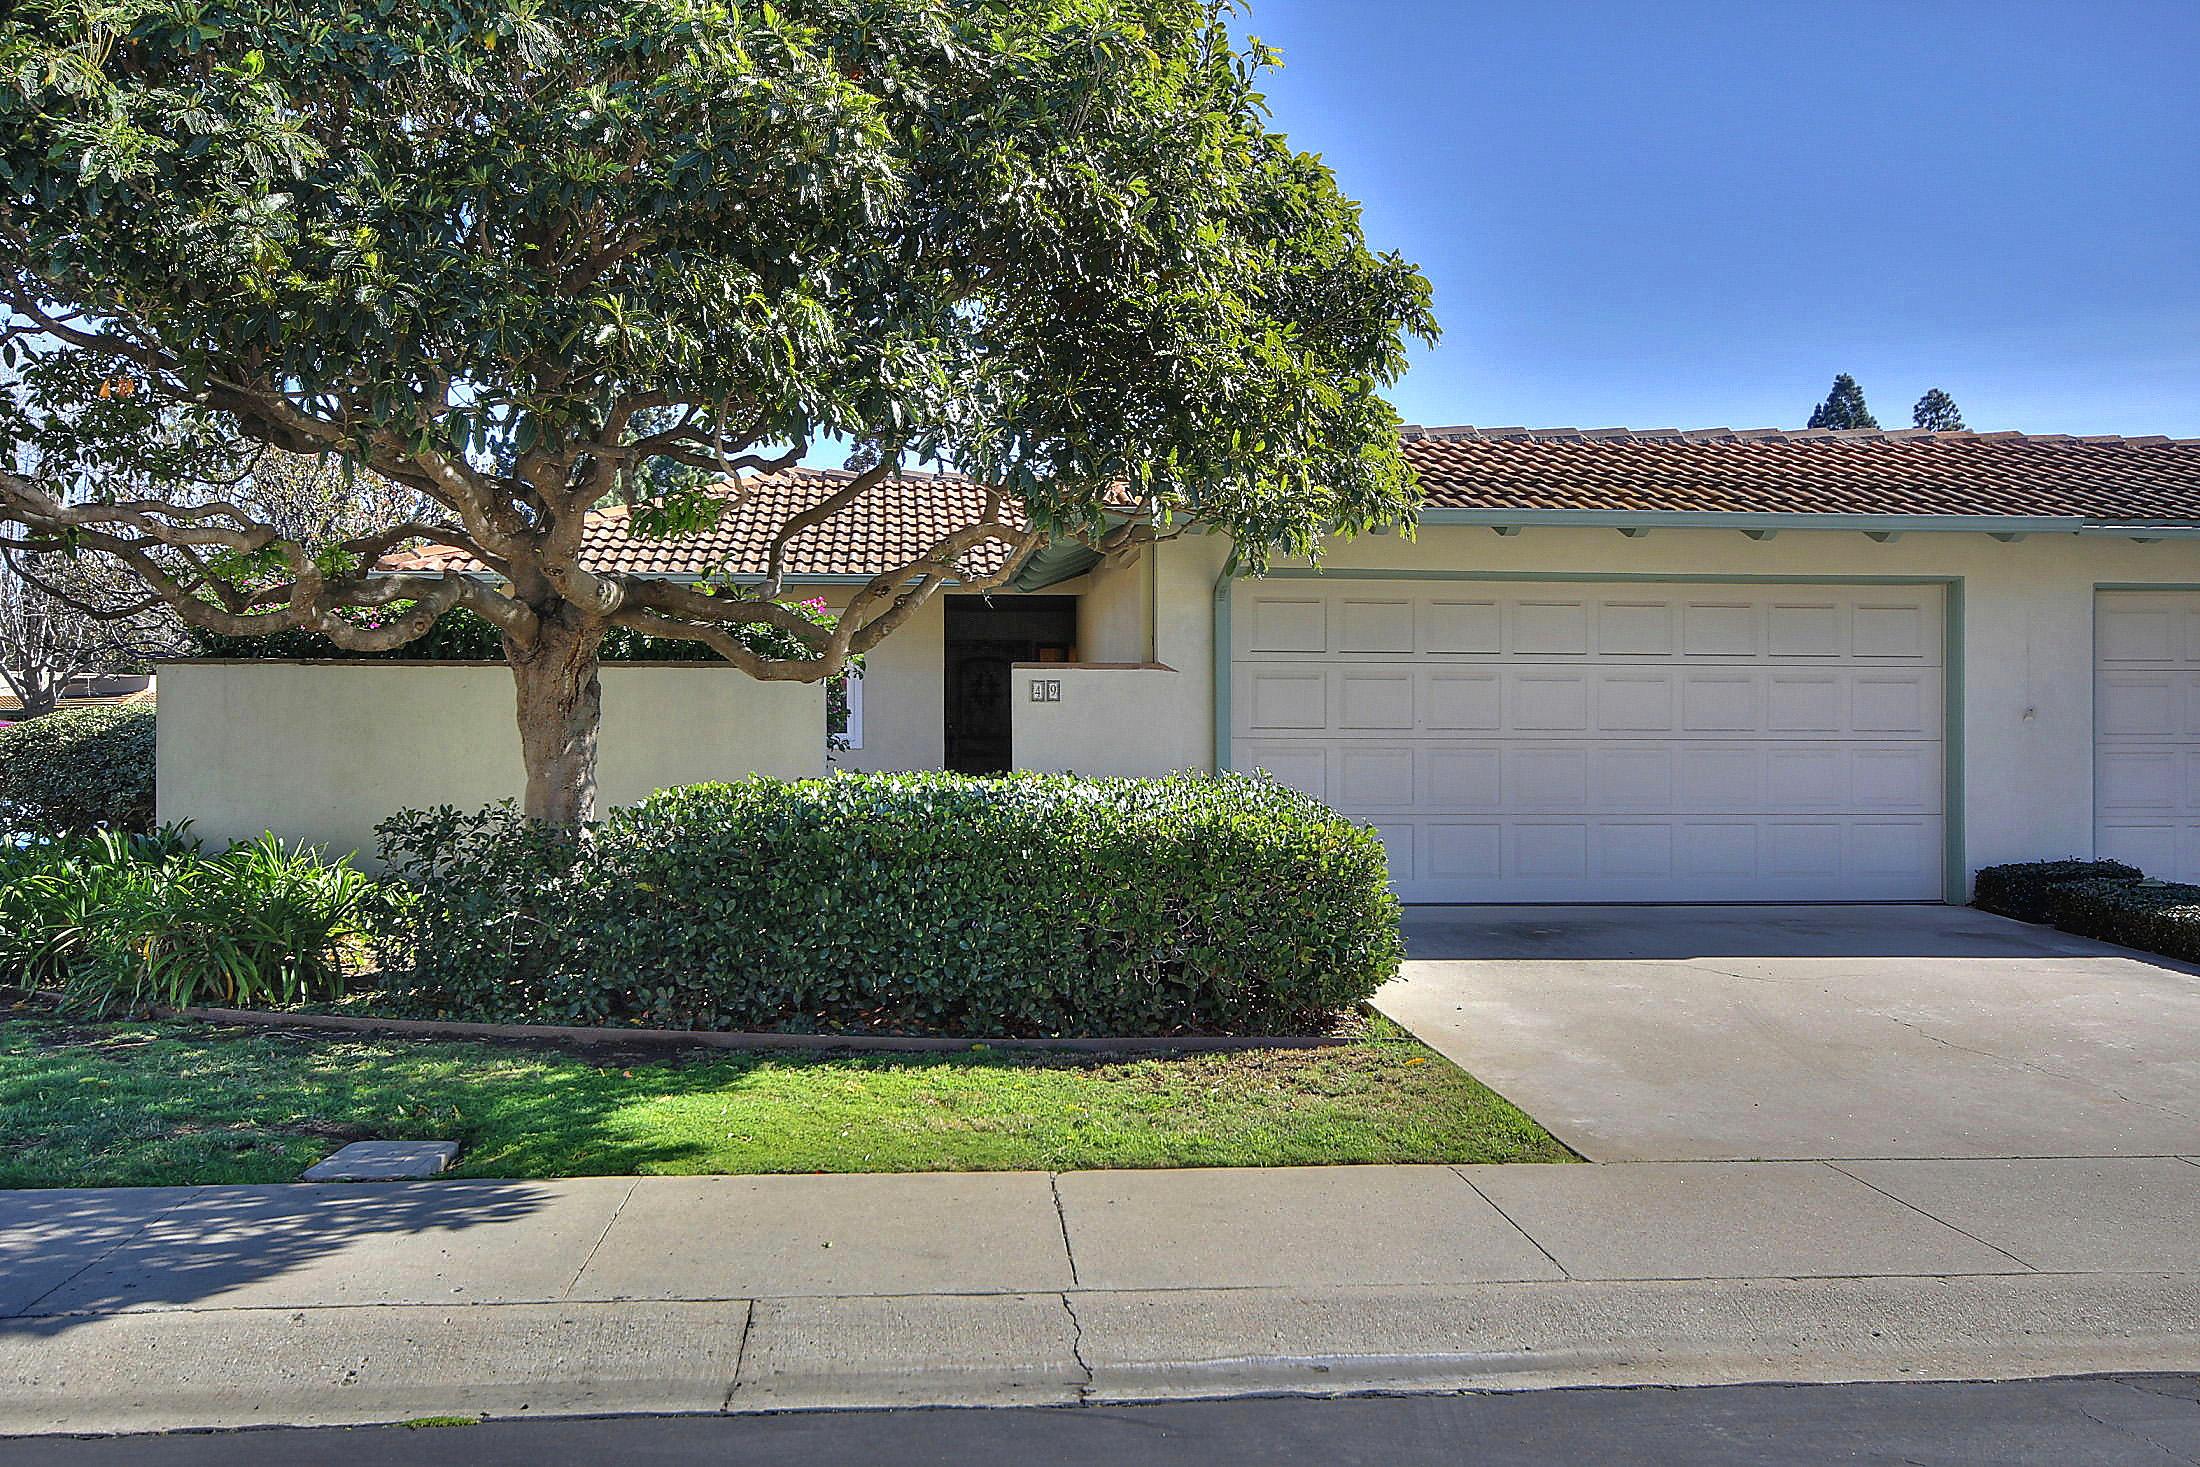 Property photo for 49 La Cumbre Cir Santa Barbara, California 93105 - 16-307